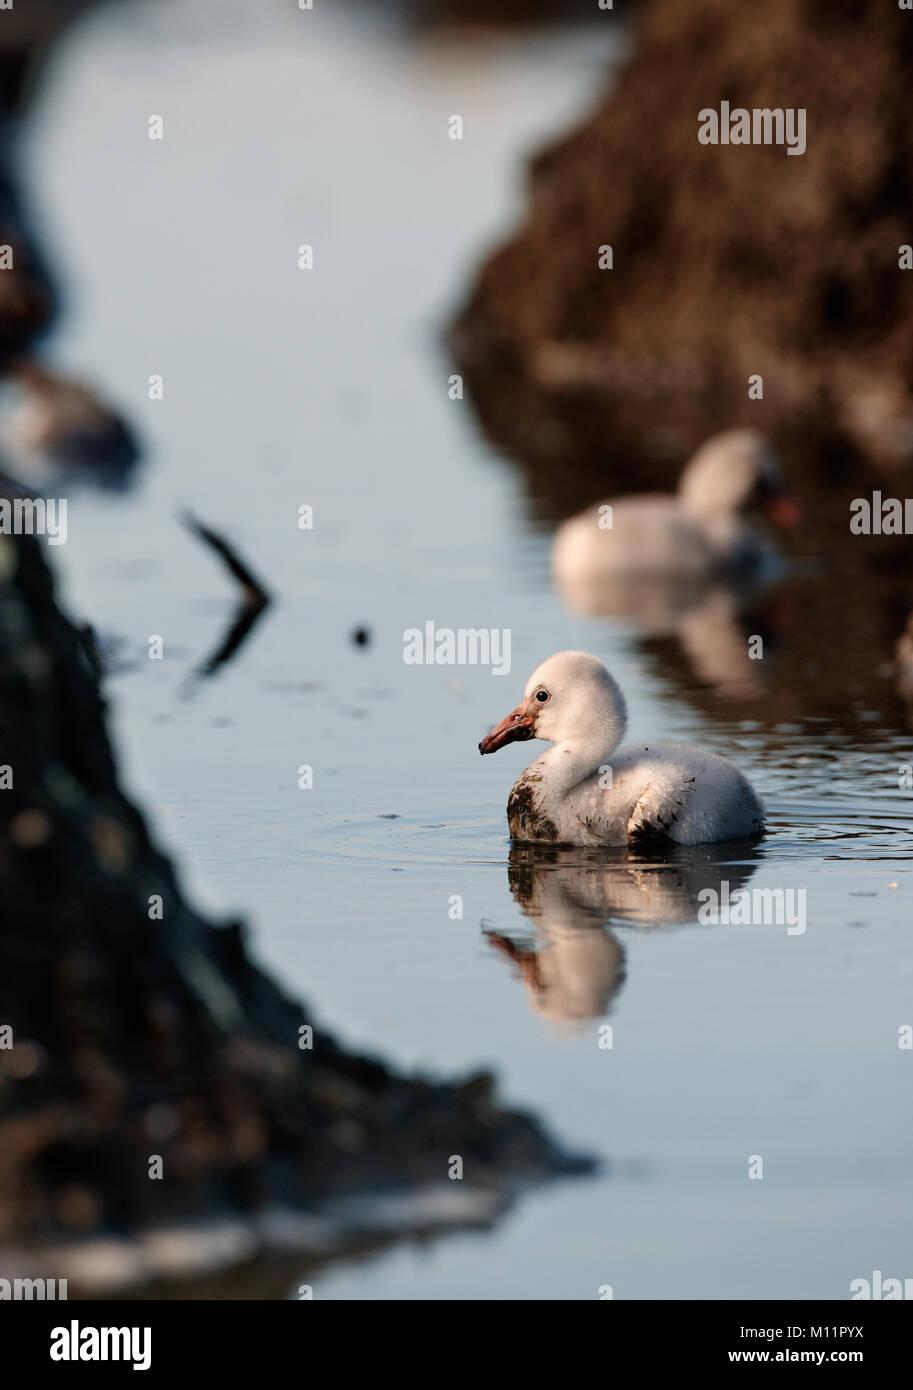 Bebé de aves del Caribe Flamingo. Una cálida y difusa bebé de aves del Caribe flamingo en nidos. Imagen De Stock